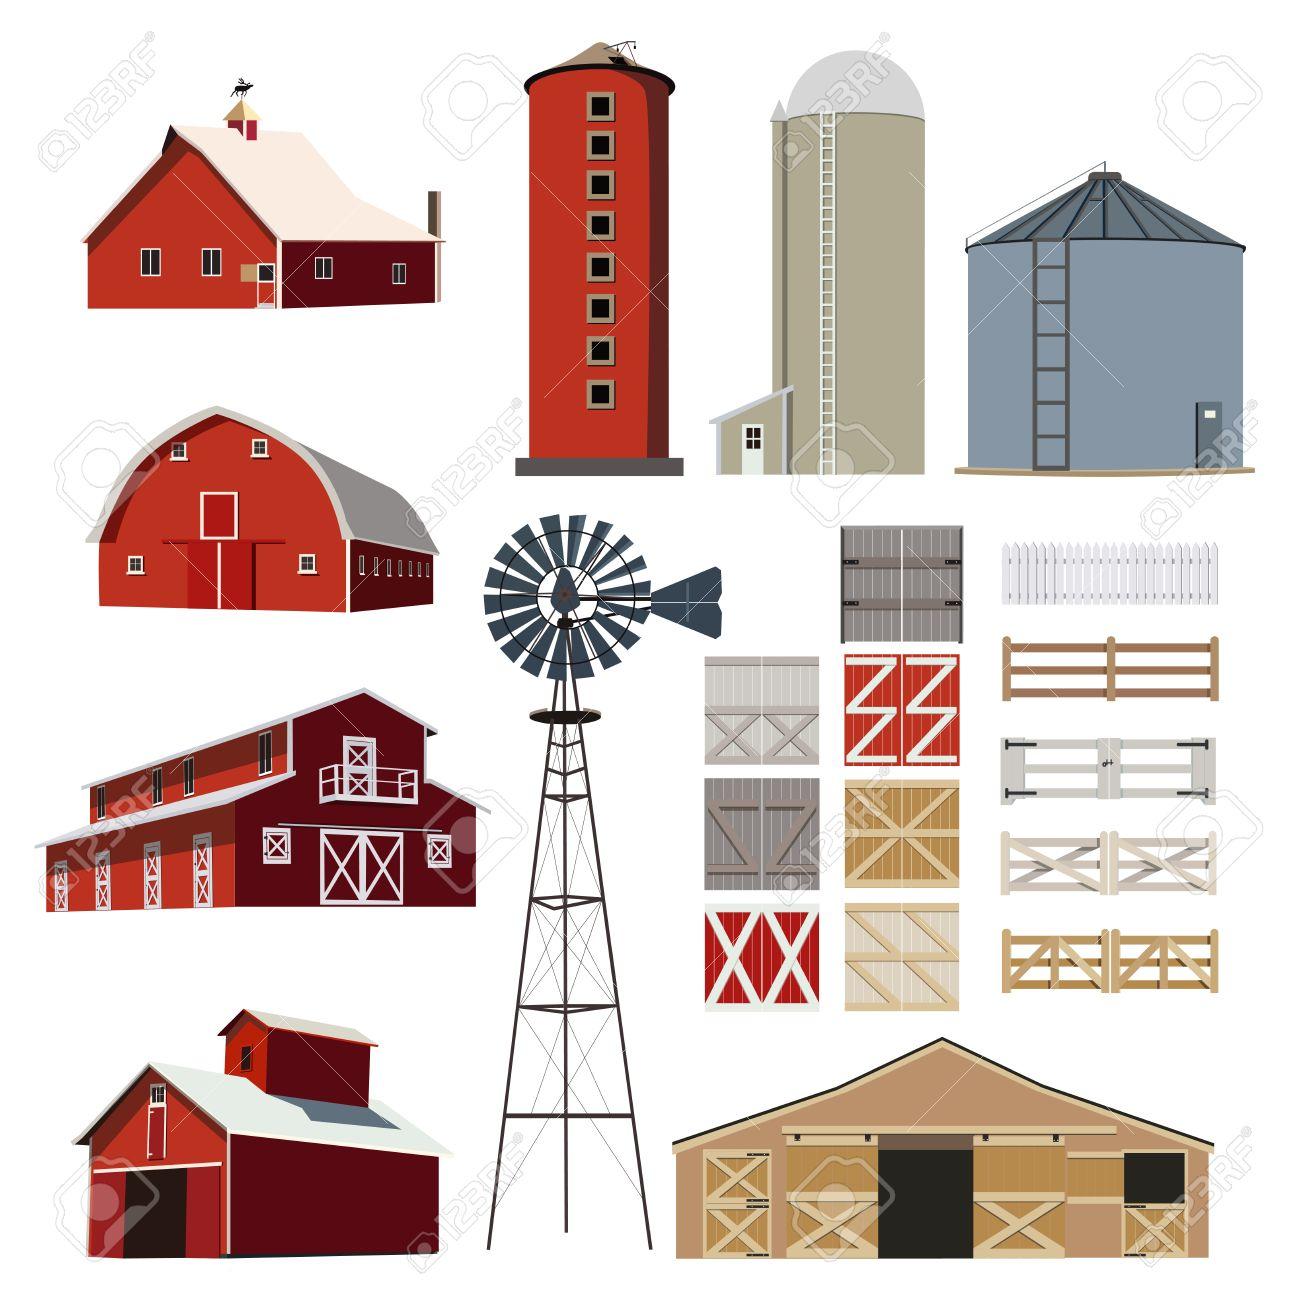 Farm house Building Livestock vector - 58851814